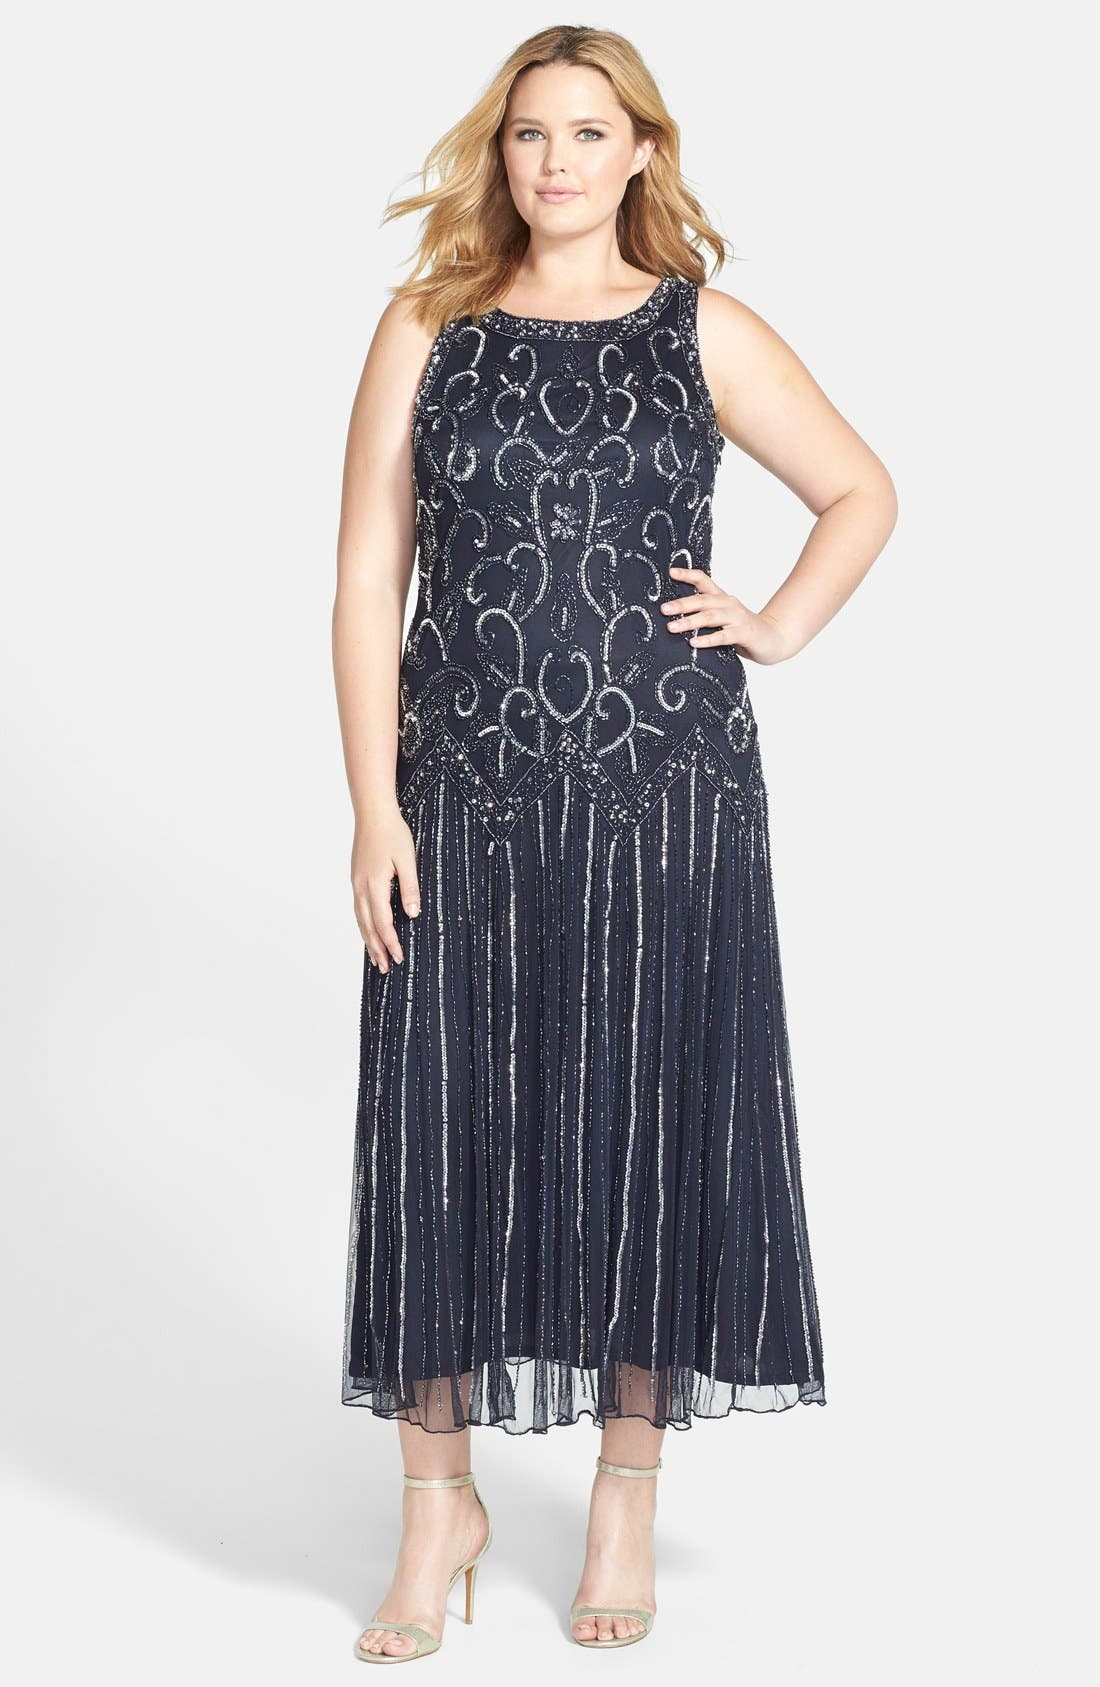 Alternate Image 1 Selected - Pisarro Nights Embellished Mesh Dress (Plus Size)